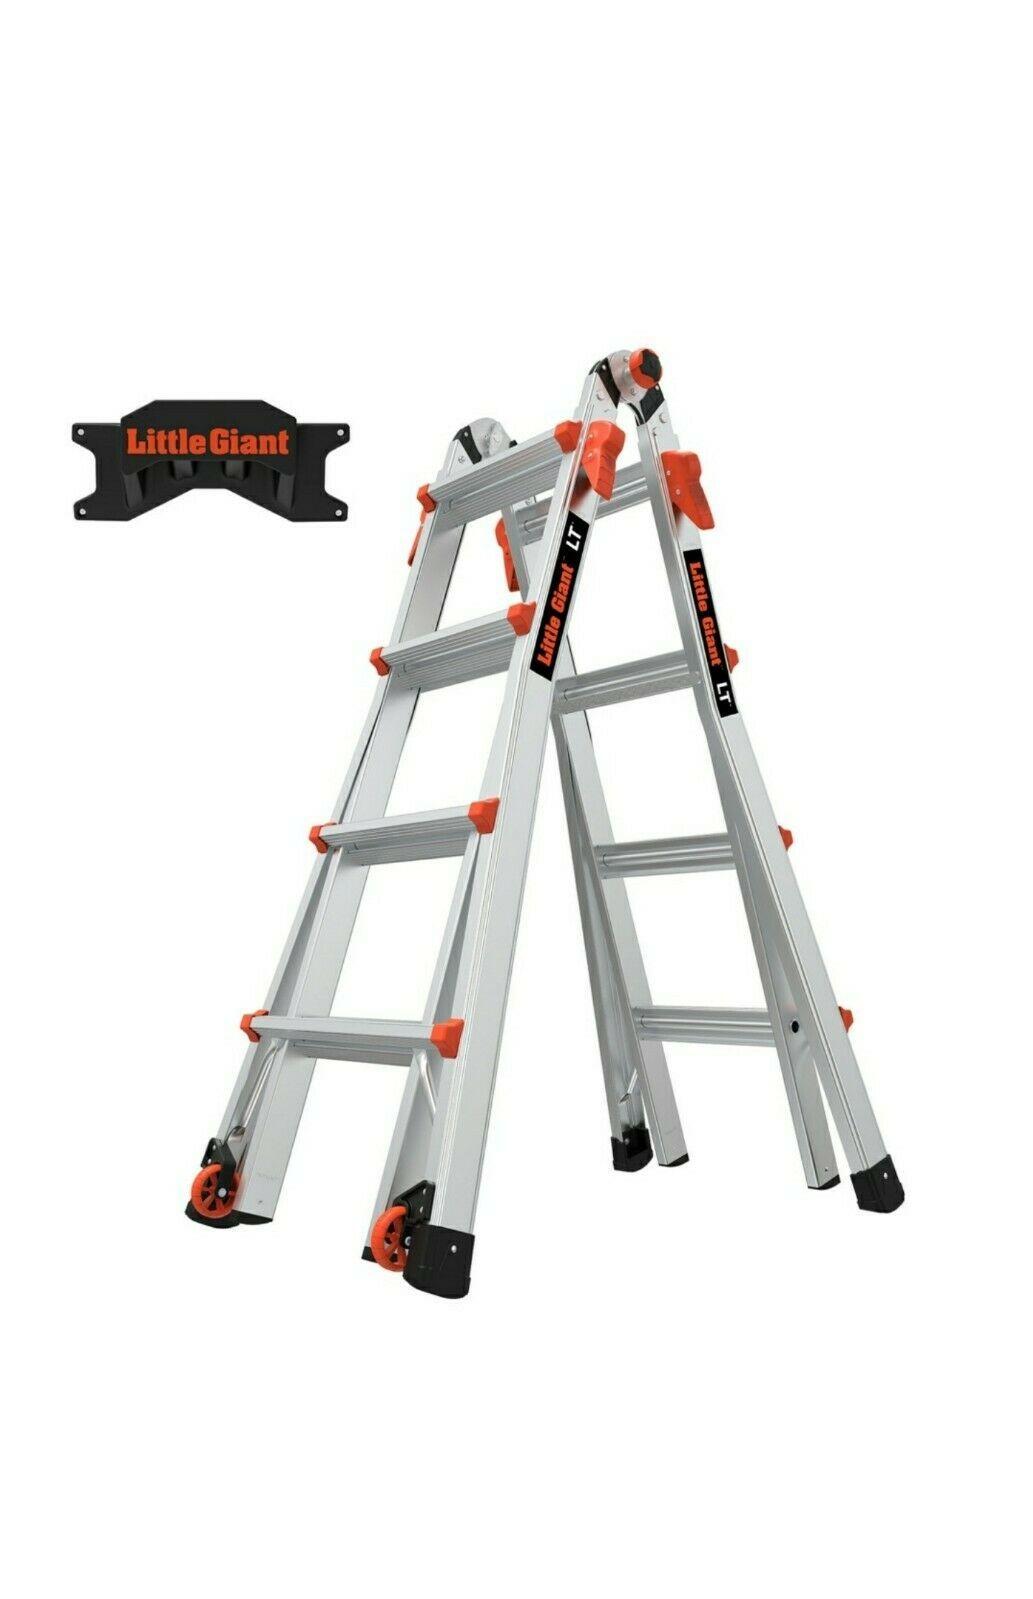 Little Giant Lt M17 Ladder With Storage Rack Multi Position Ladder Aluminum 17ft In 2020 Ladder Storage Ladder Decor Black Bar Stools